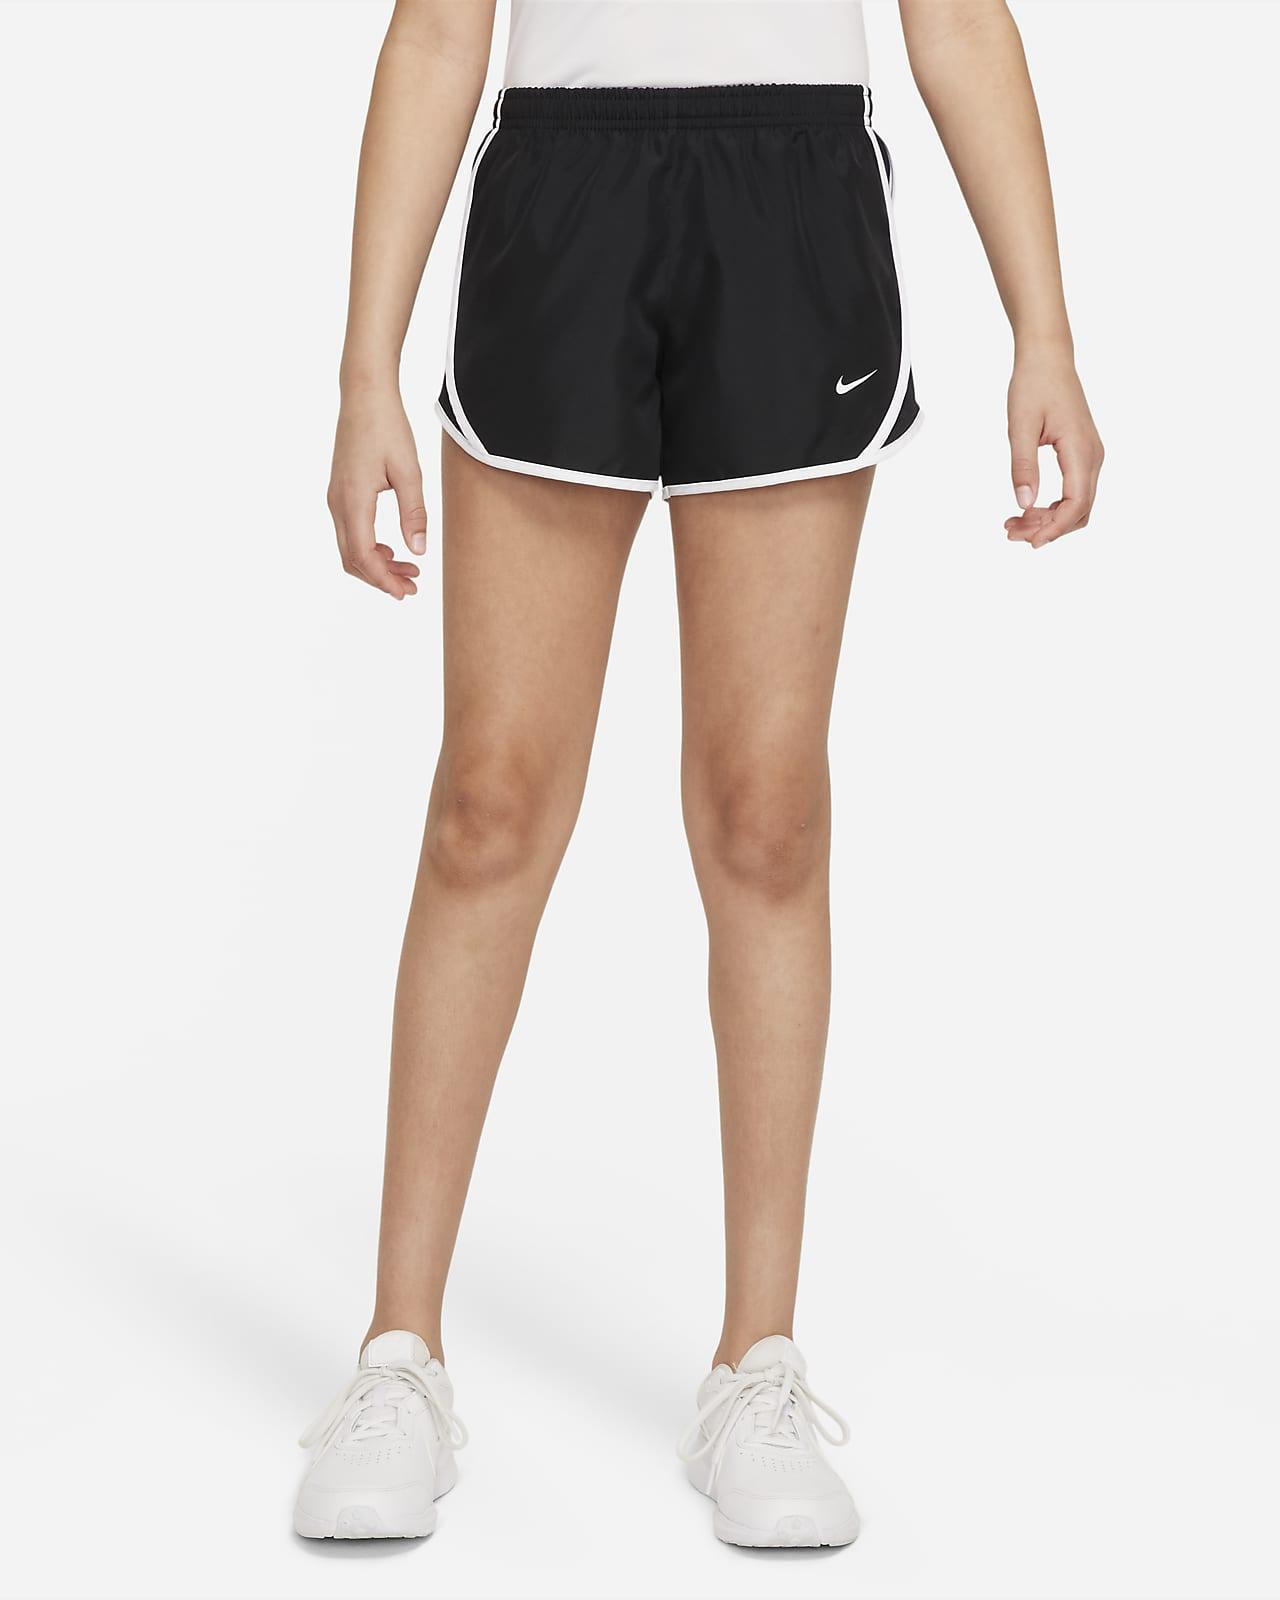 Shorts de running para niñas talla grande Nike Dri-FIT Tempo